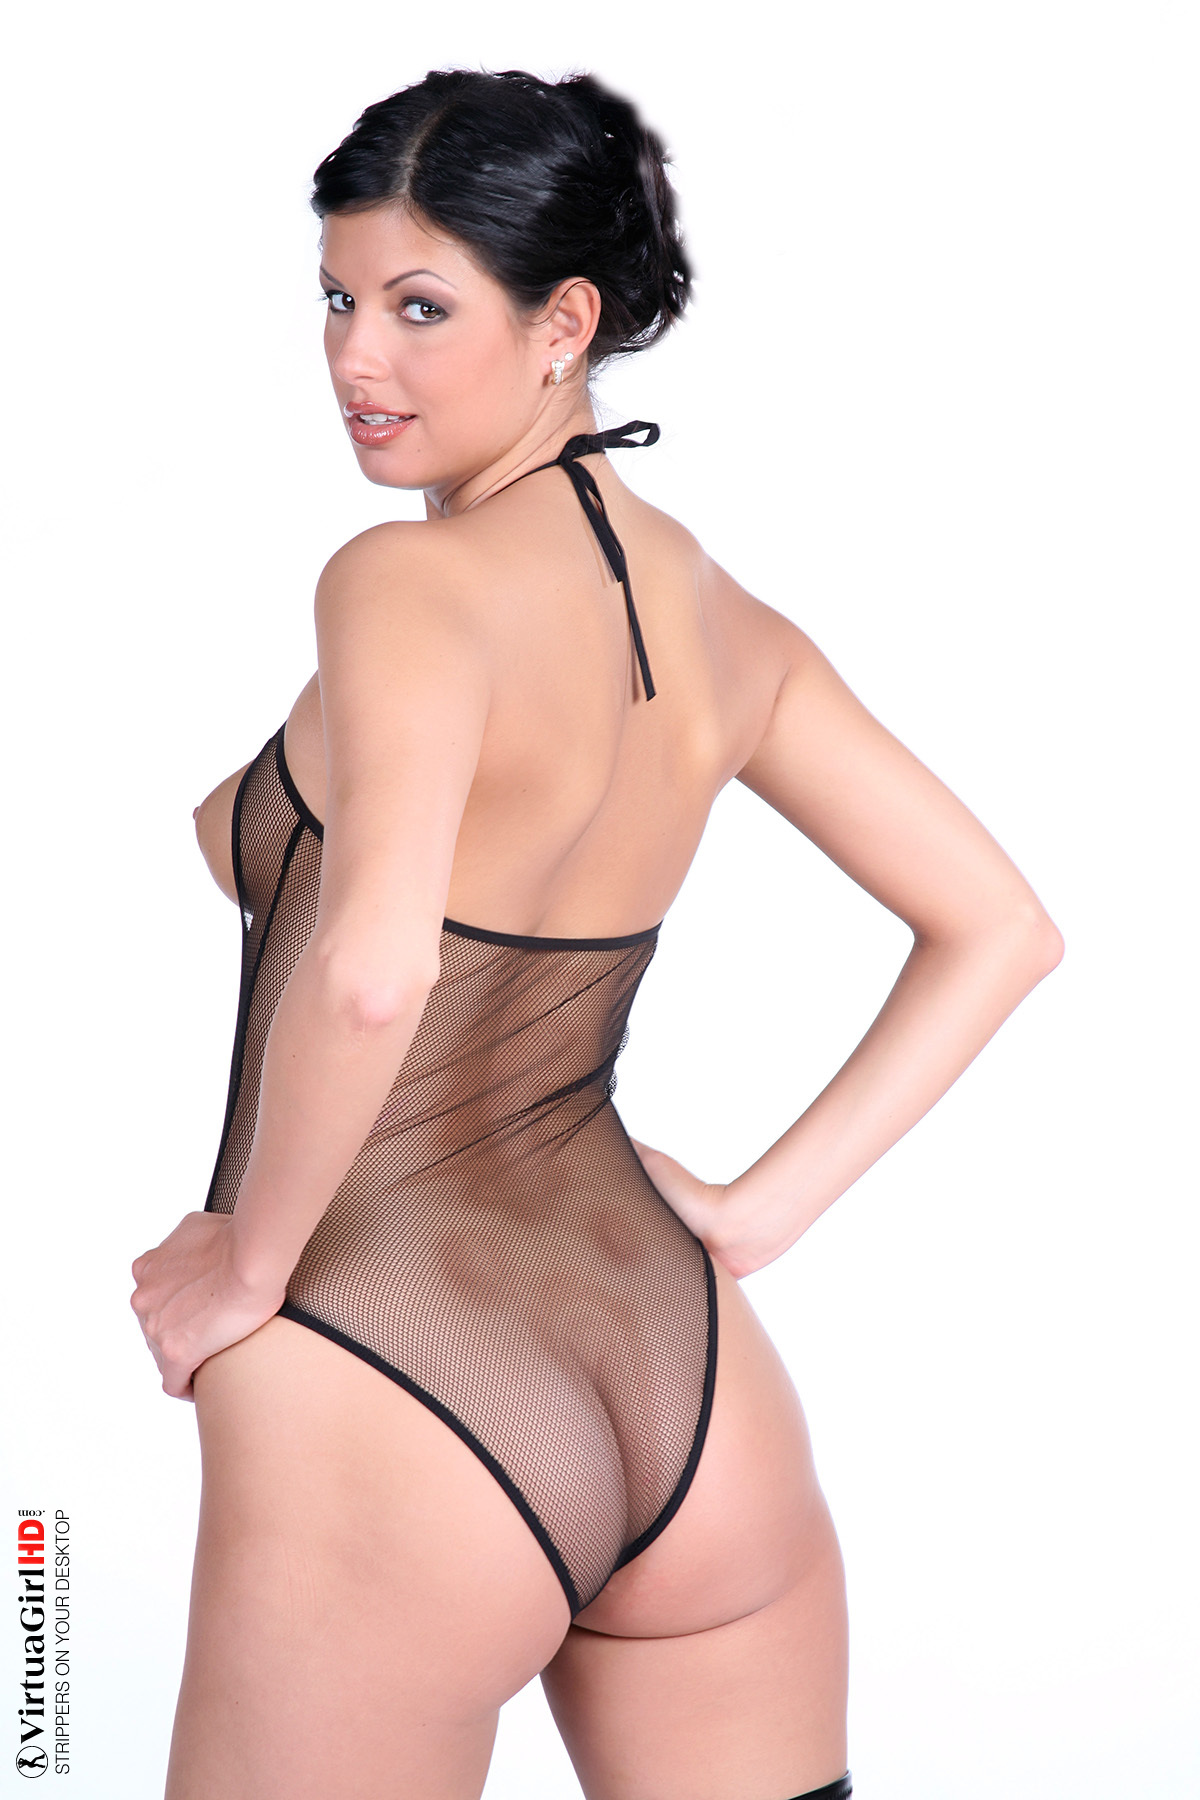 girls stripping big boobs